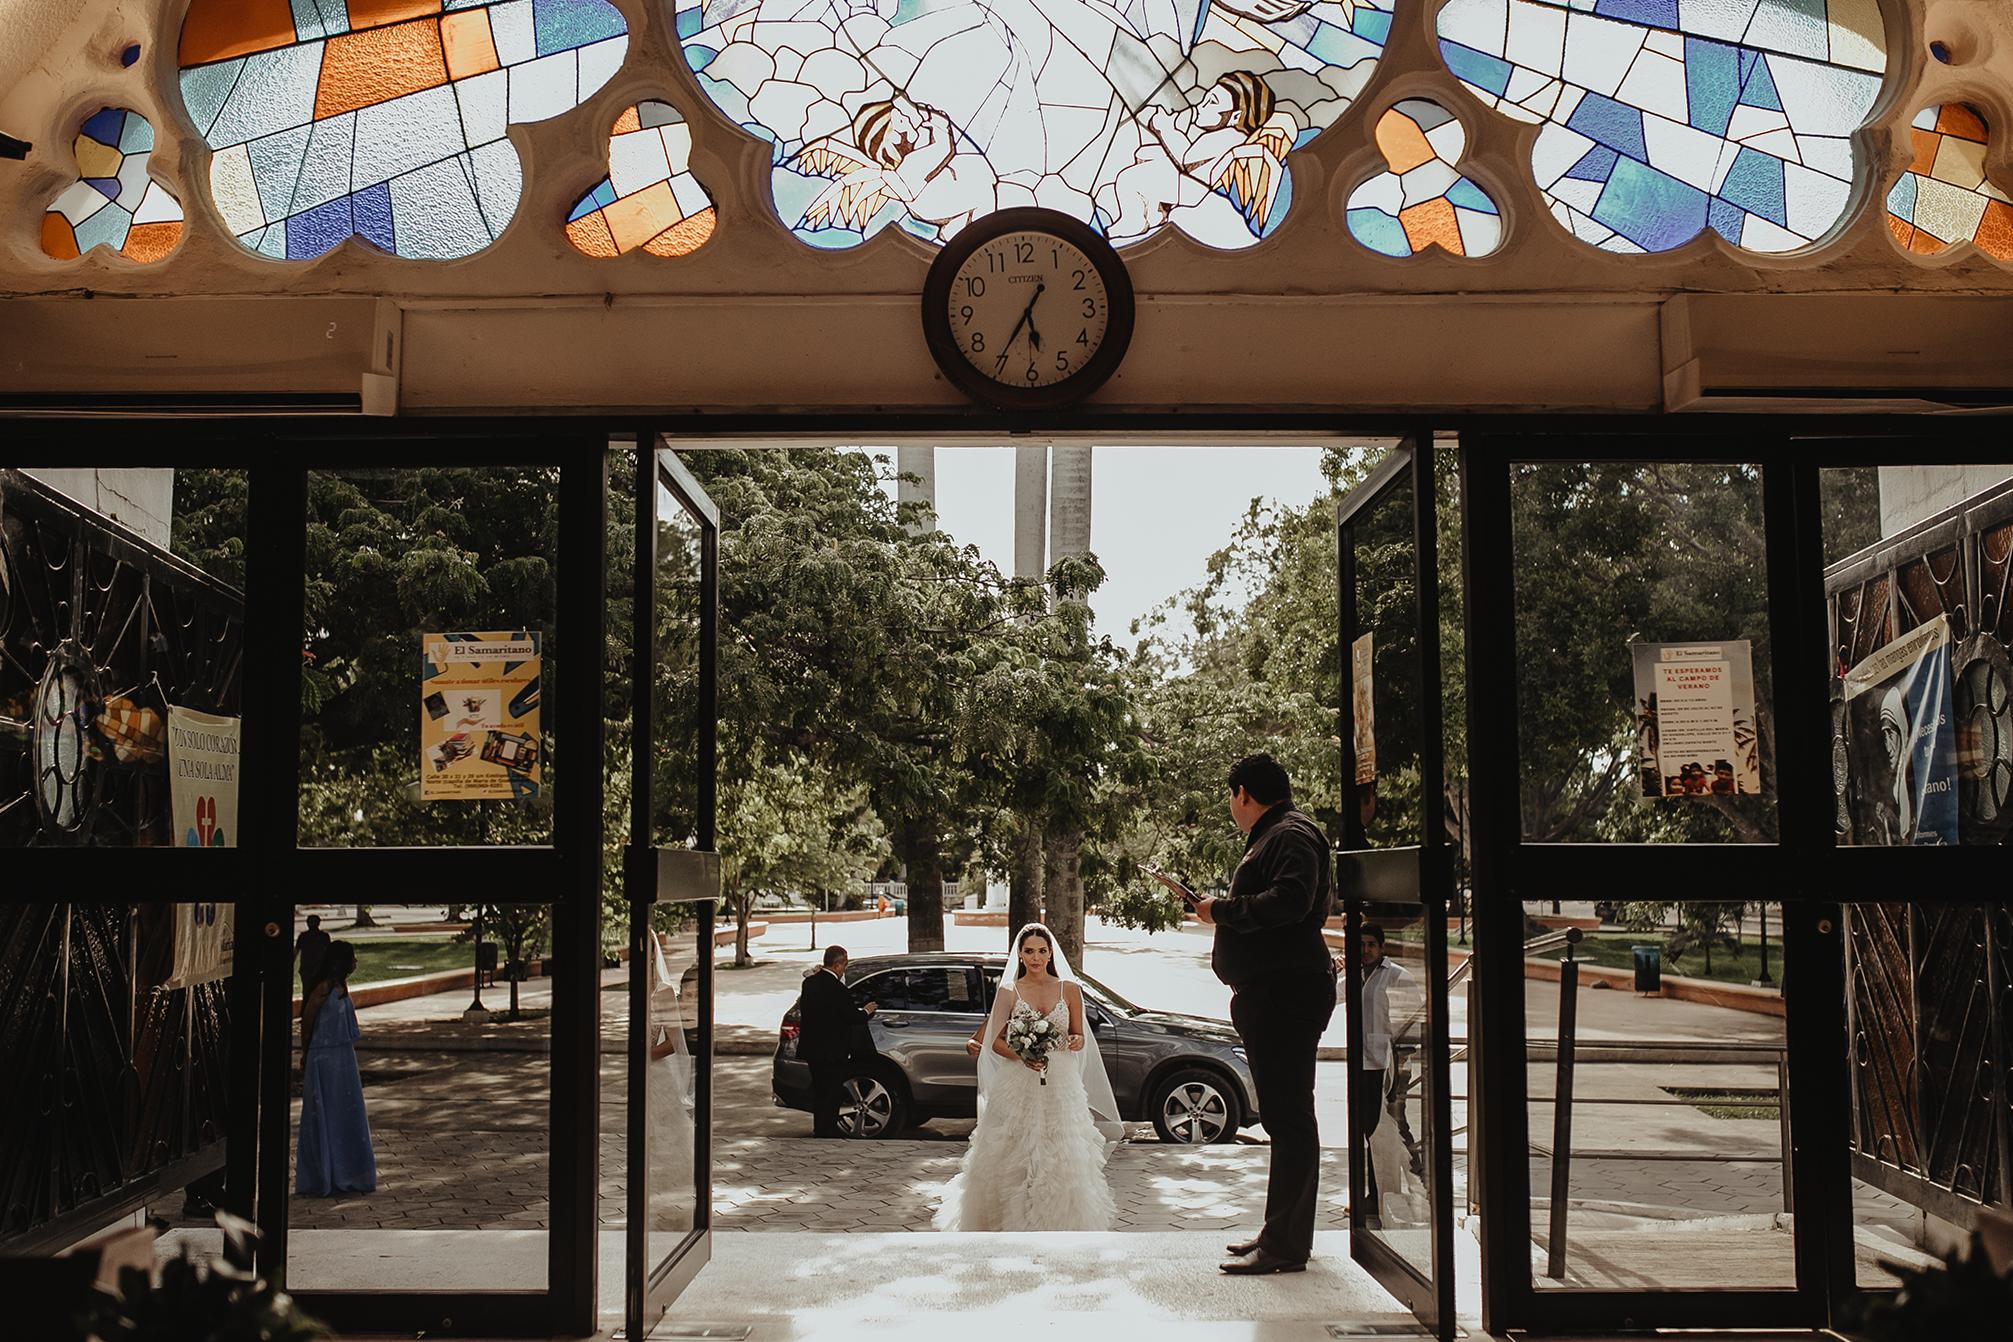 0555R&F__WeddingDestination_Weddingmerida_BodaMexico_FotografoDeBodas_FabrizioSimoneenFotografo.jpg